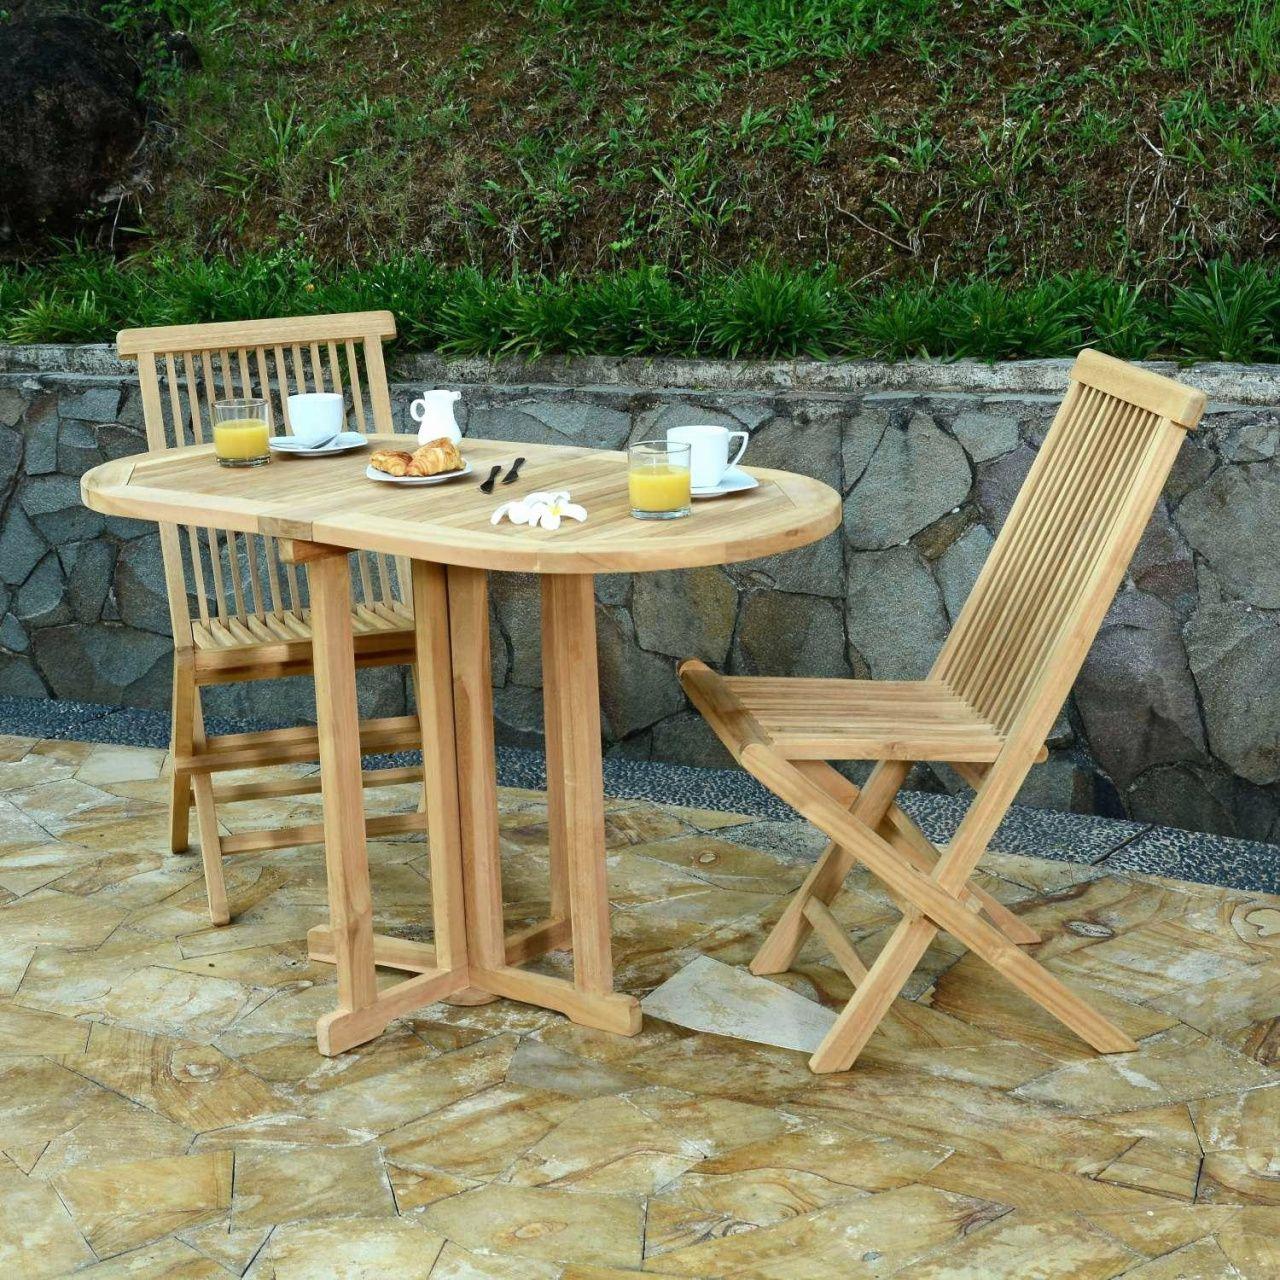 50 Centrakor Table De Jardin | Reupholster Furniture, Cool ... destiné Table De Jardin Centrakor